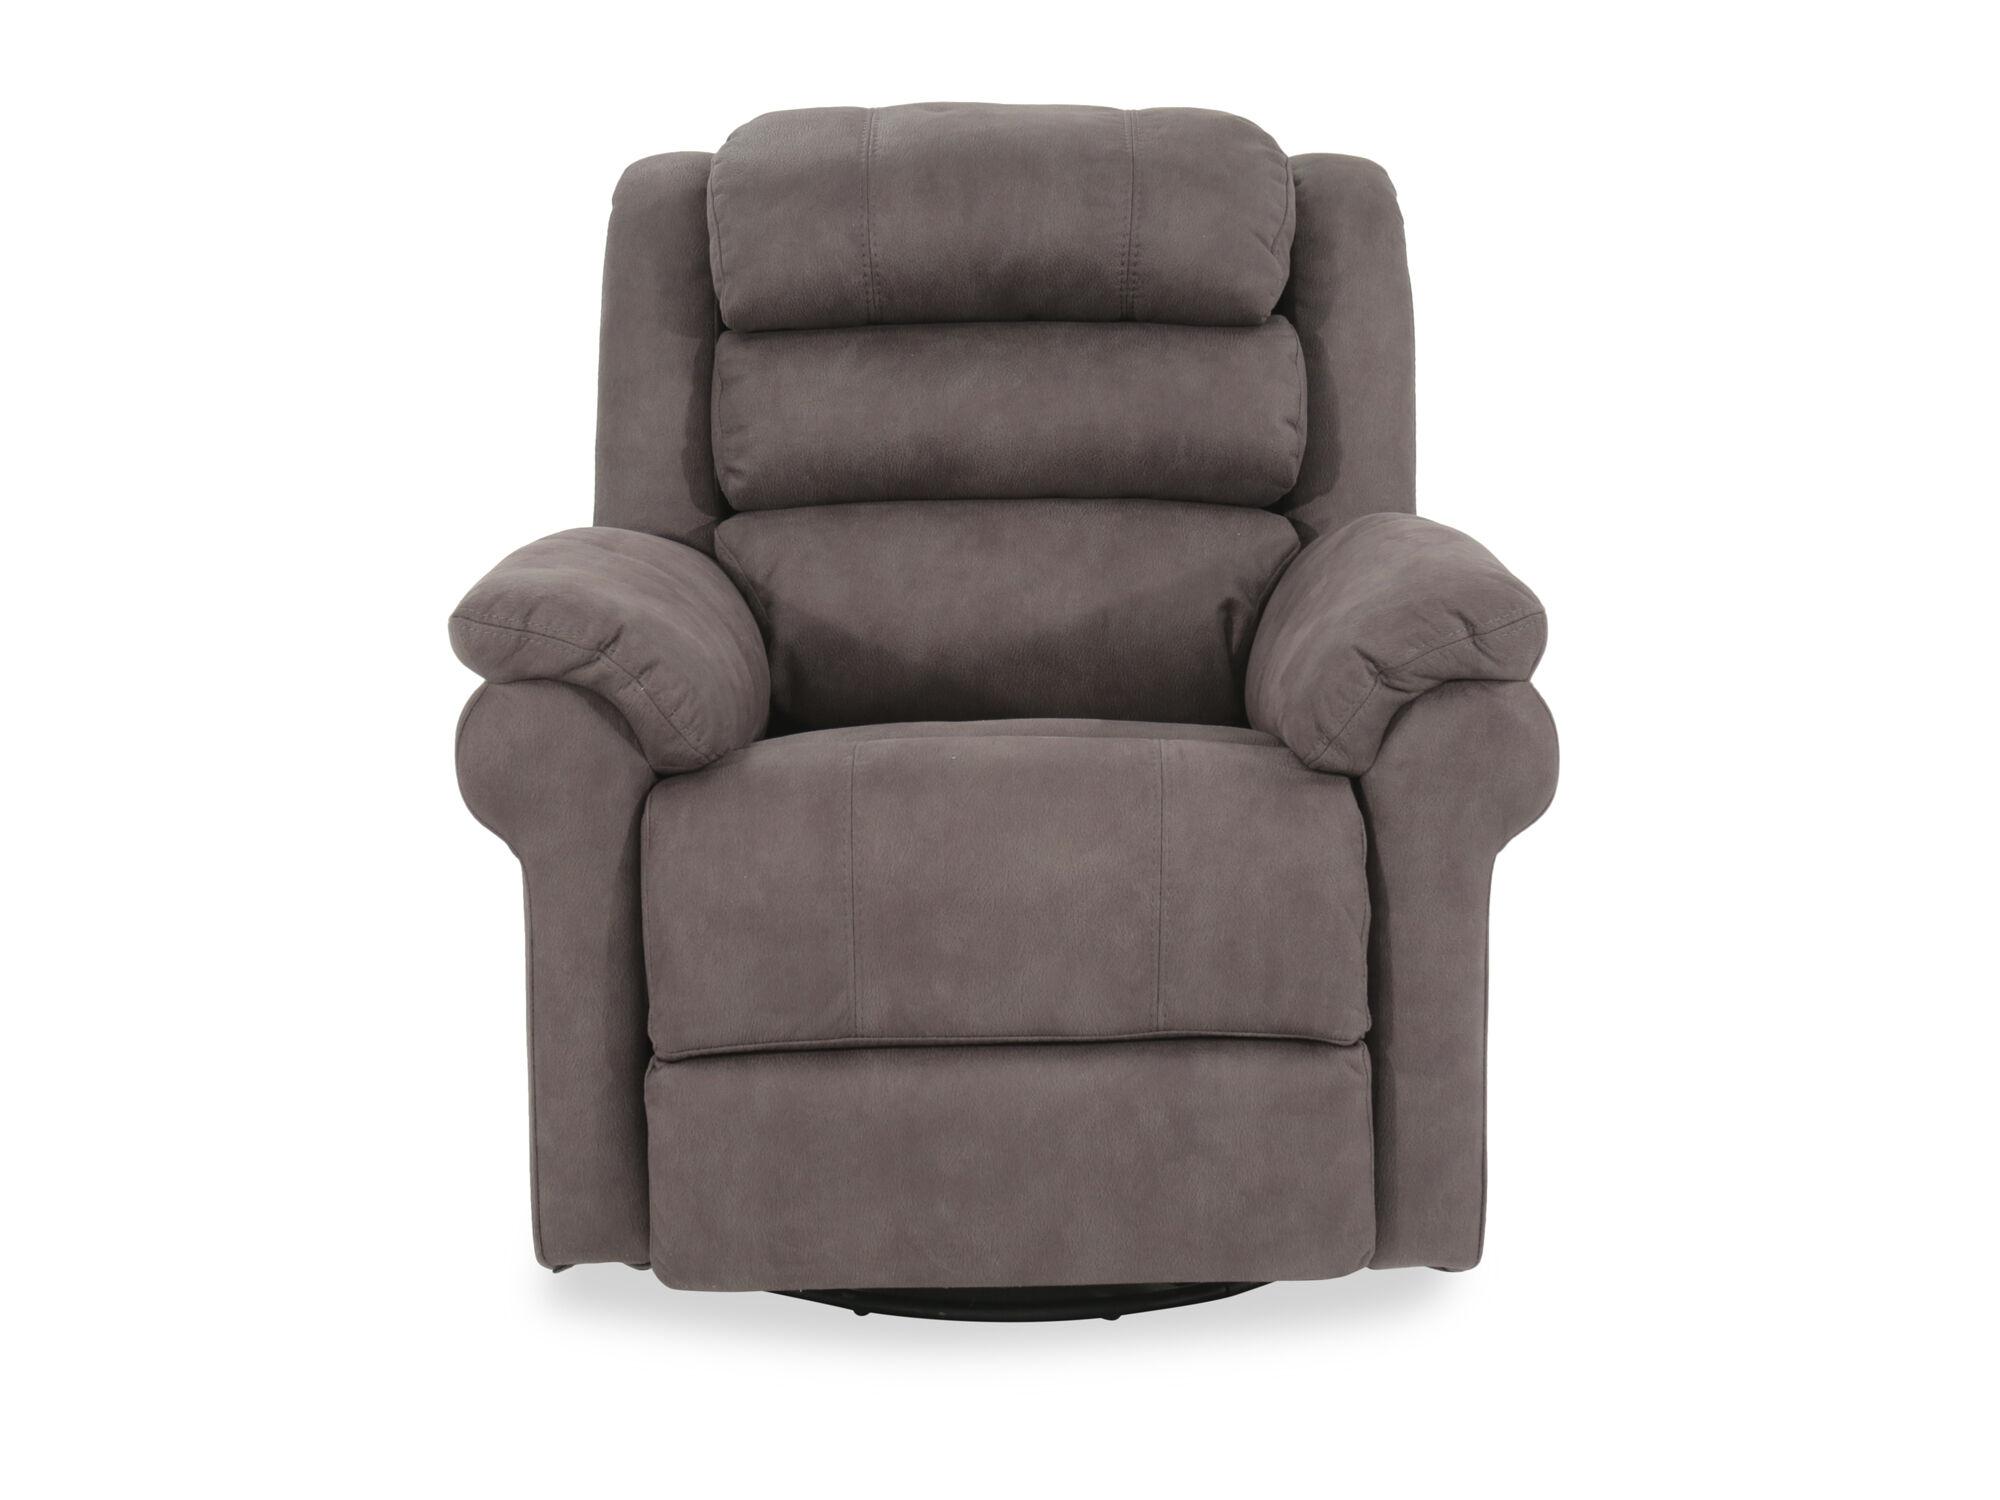 recliner chair covers grey beach cooler backpack boulevard gray power swivel glider mathis